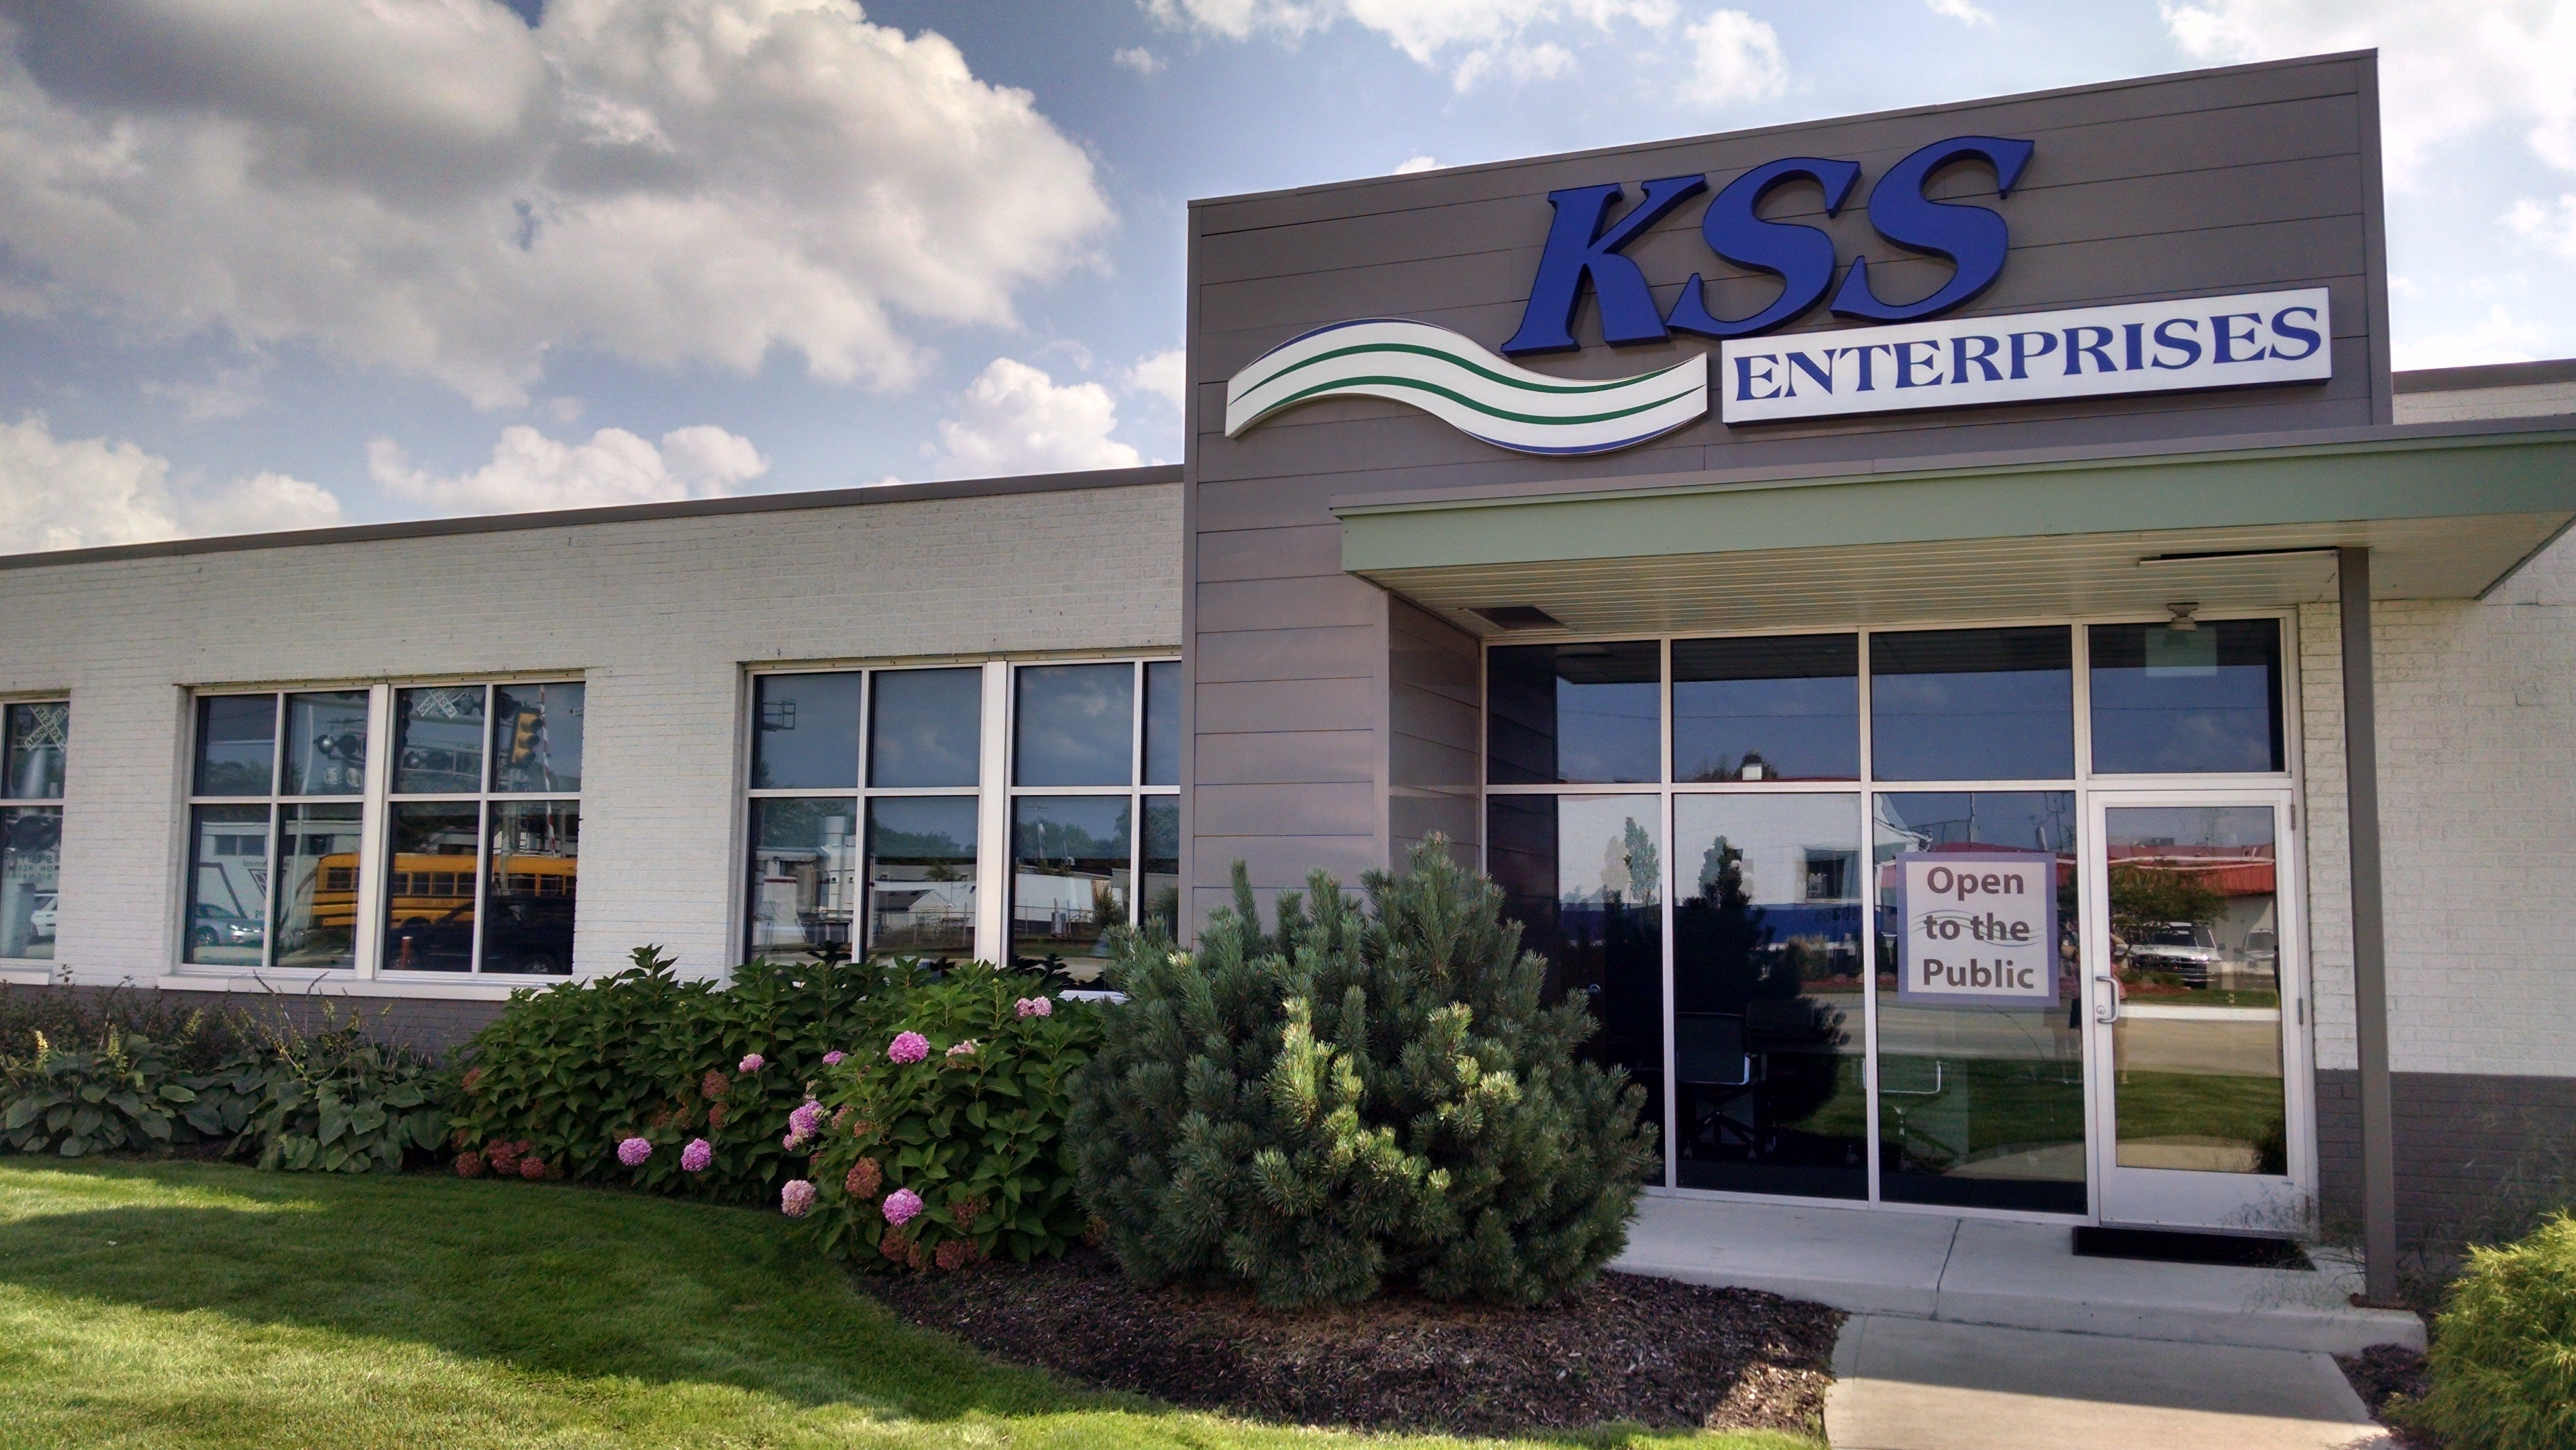 Grand Rapids Mi Kss Enterprises